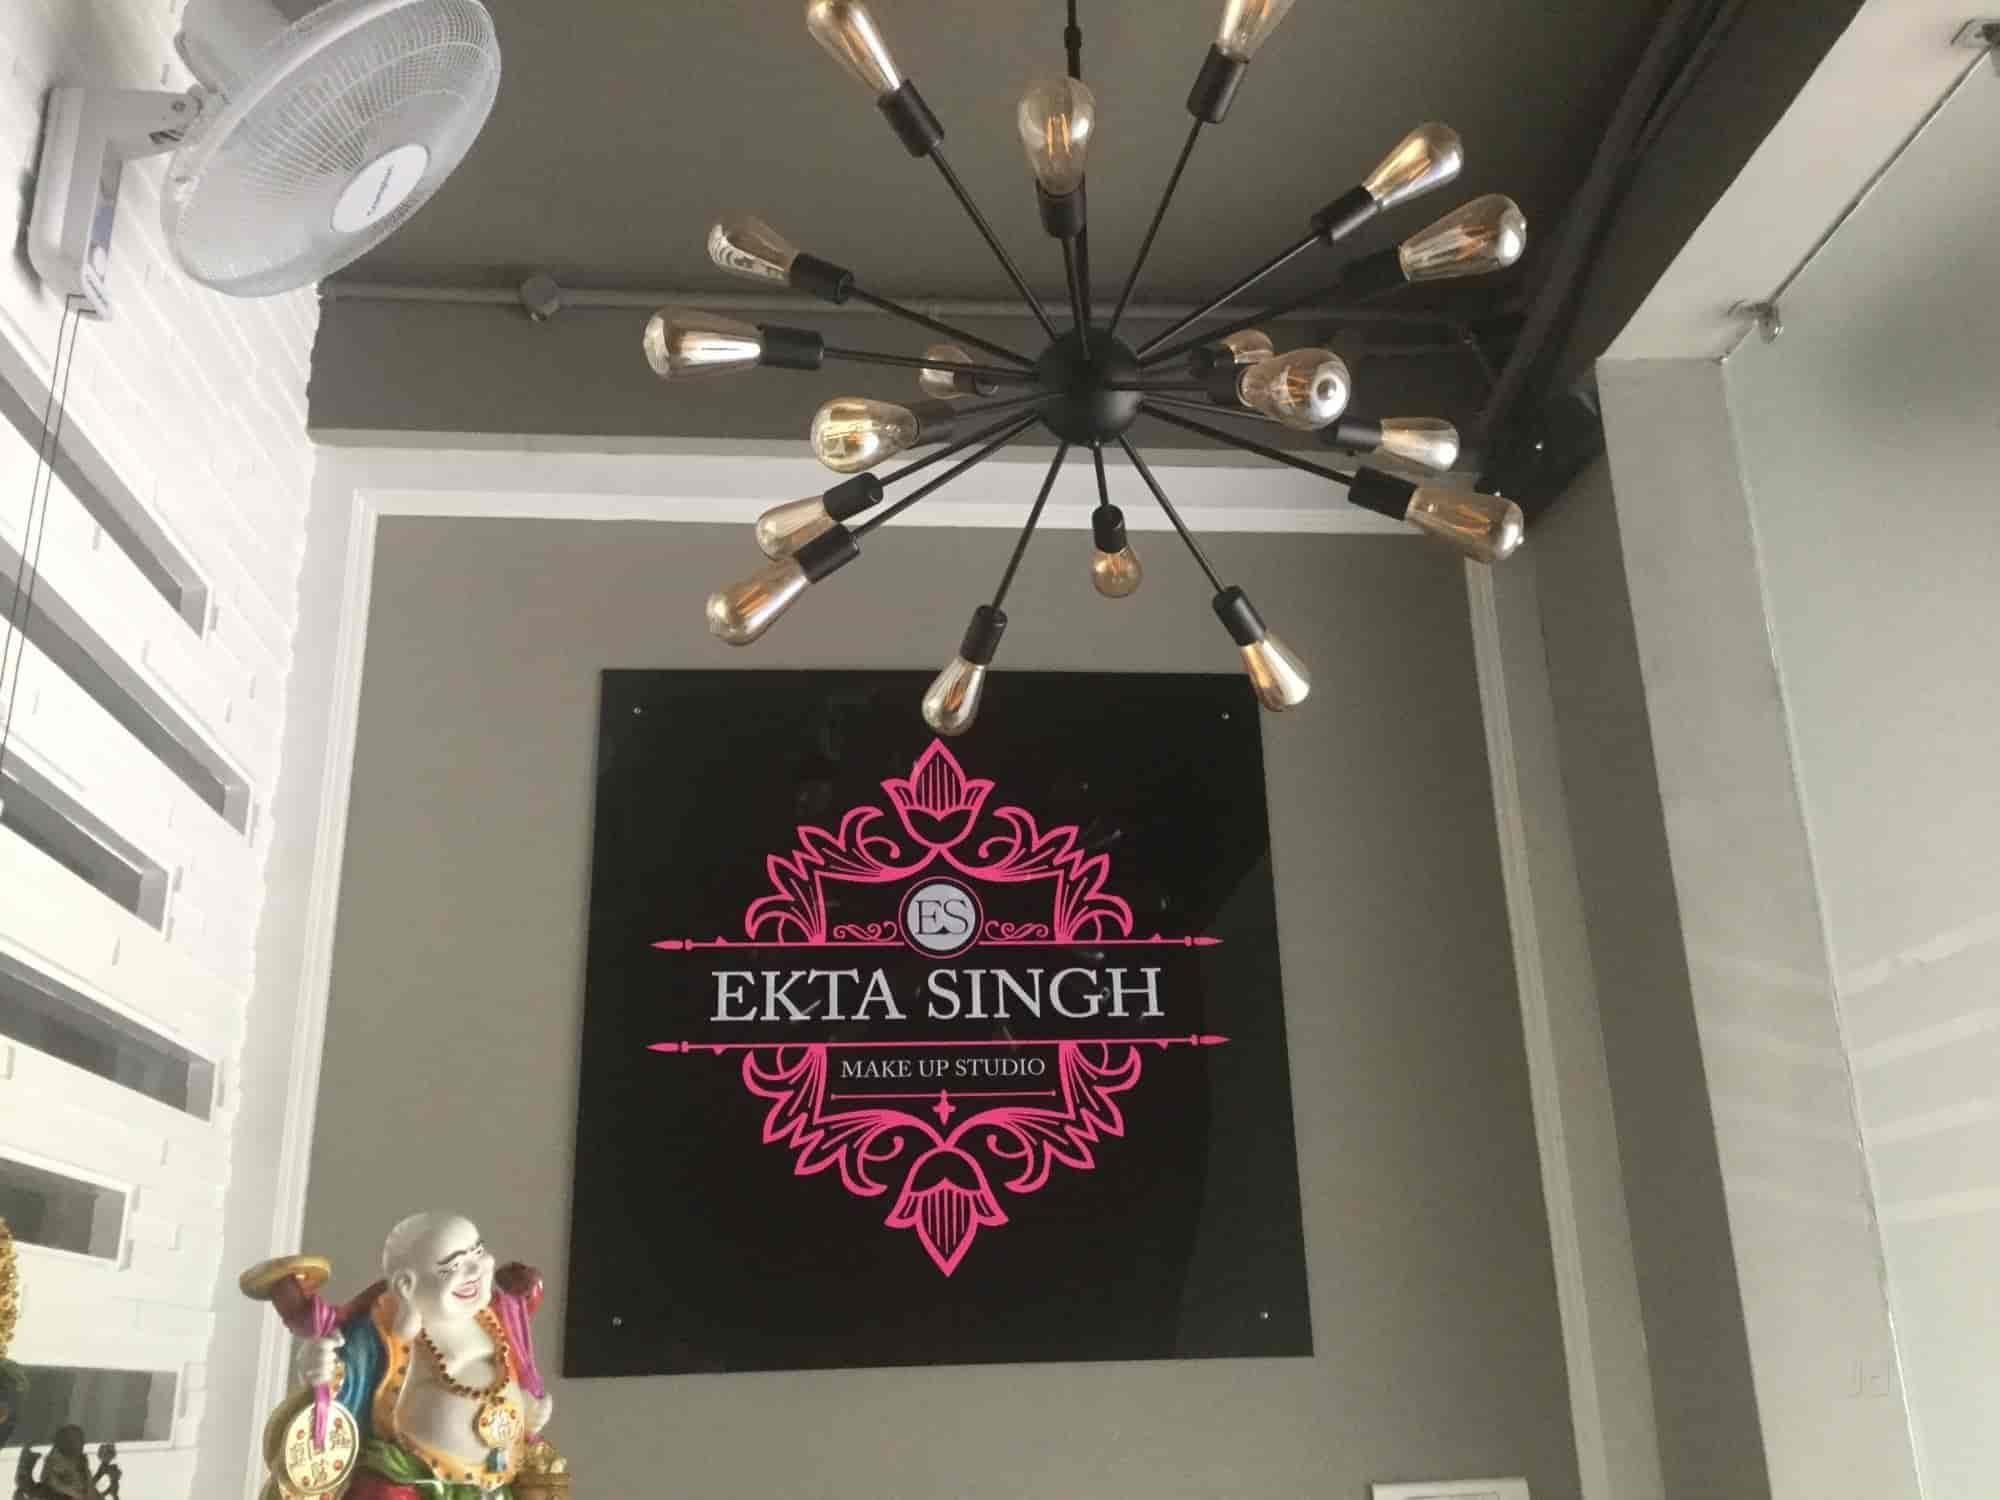 ekta singh makeup studio photos rdc raj nagar delhi pictures